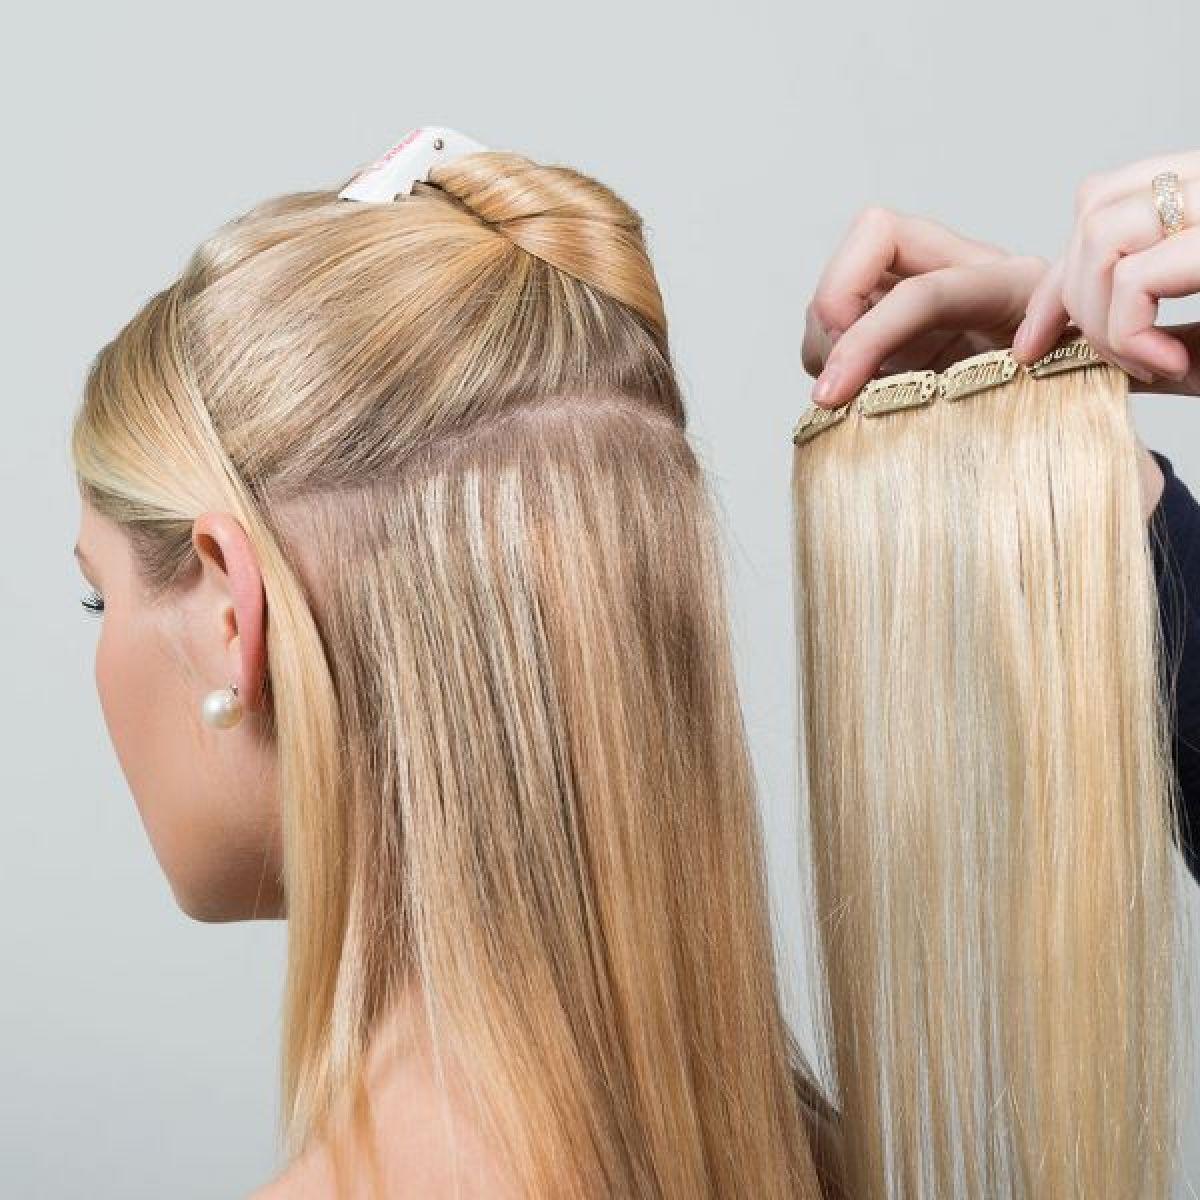 Extensions de cheveux à Reims (51) Par Sheherazade - Estheca